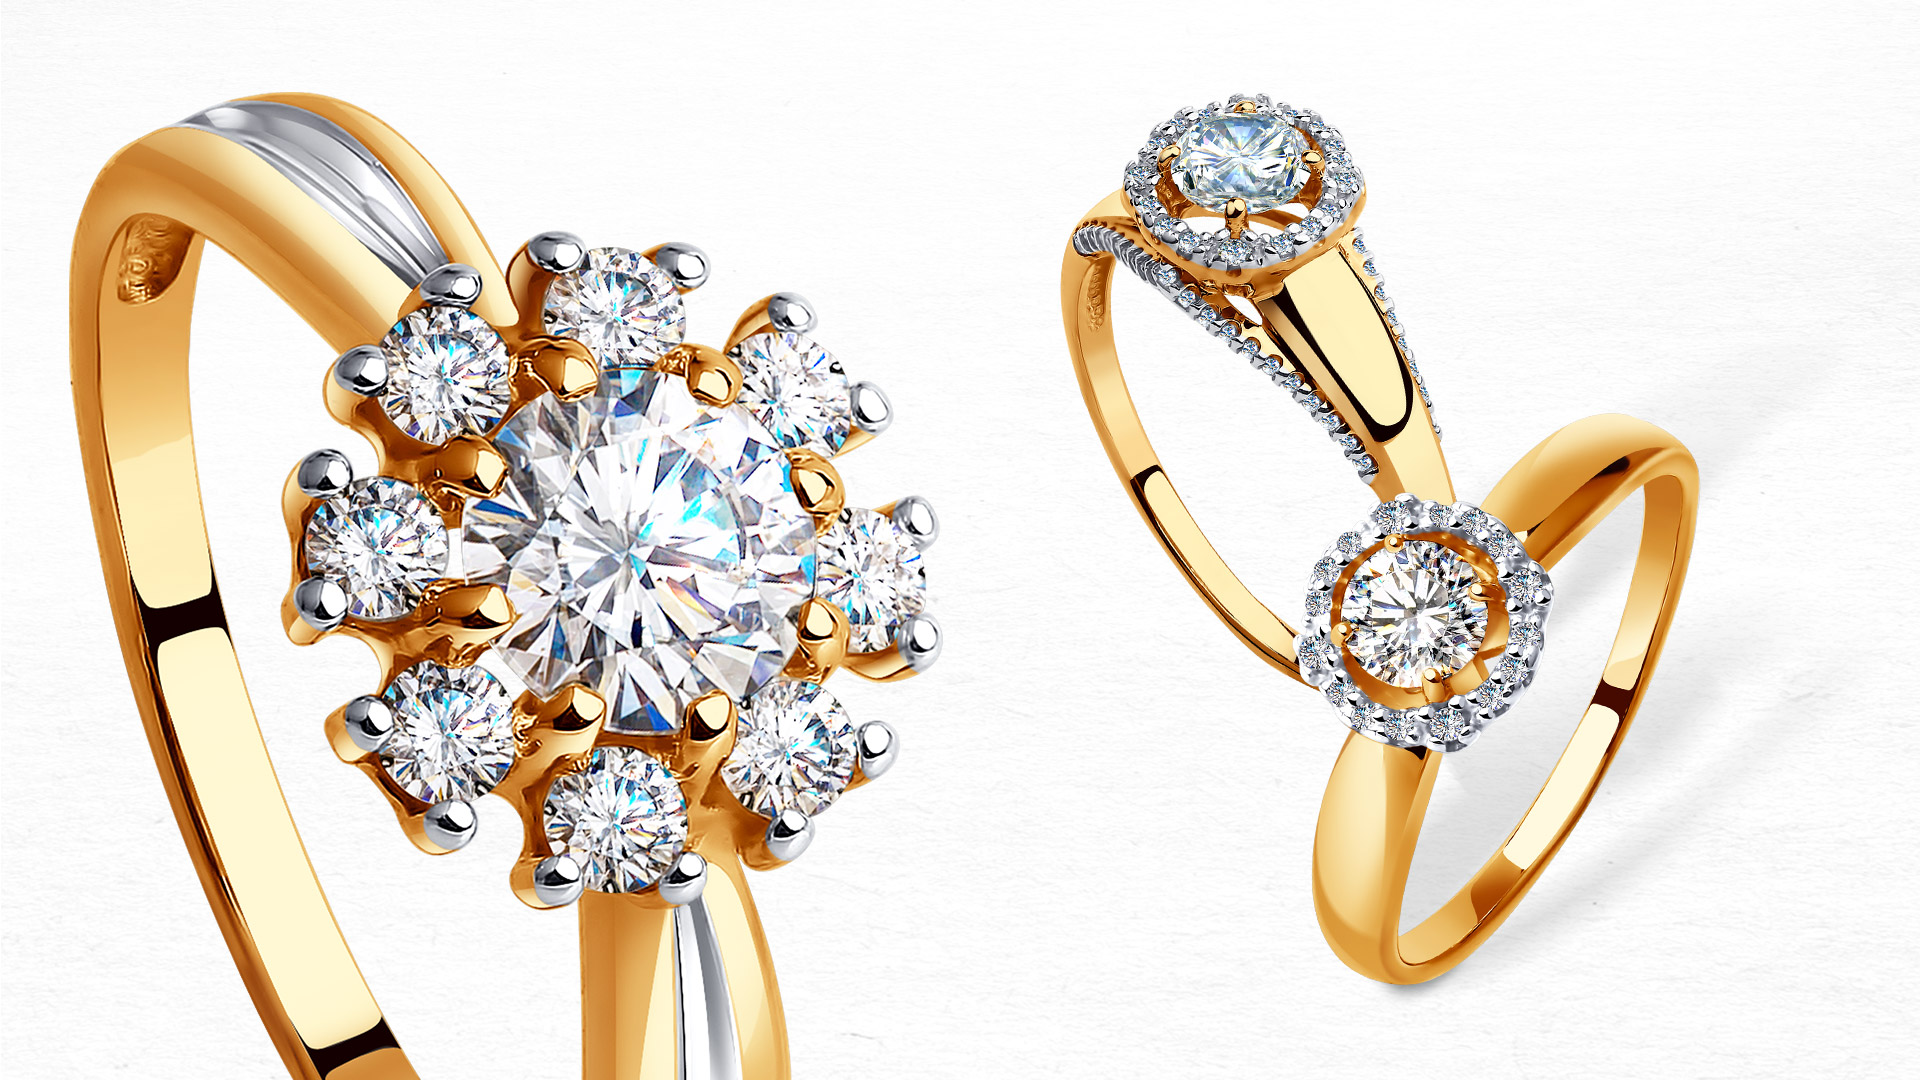 Картинки по запросу Кольца с бриллиантами – мечта для каждого